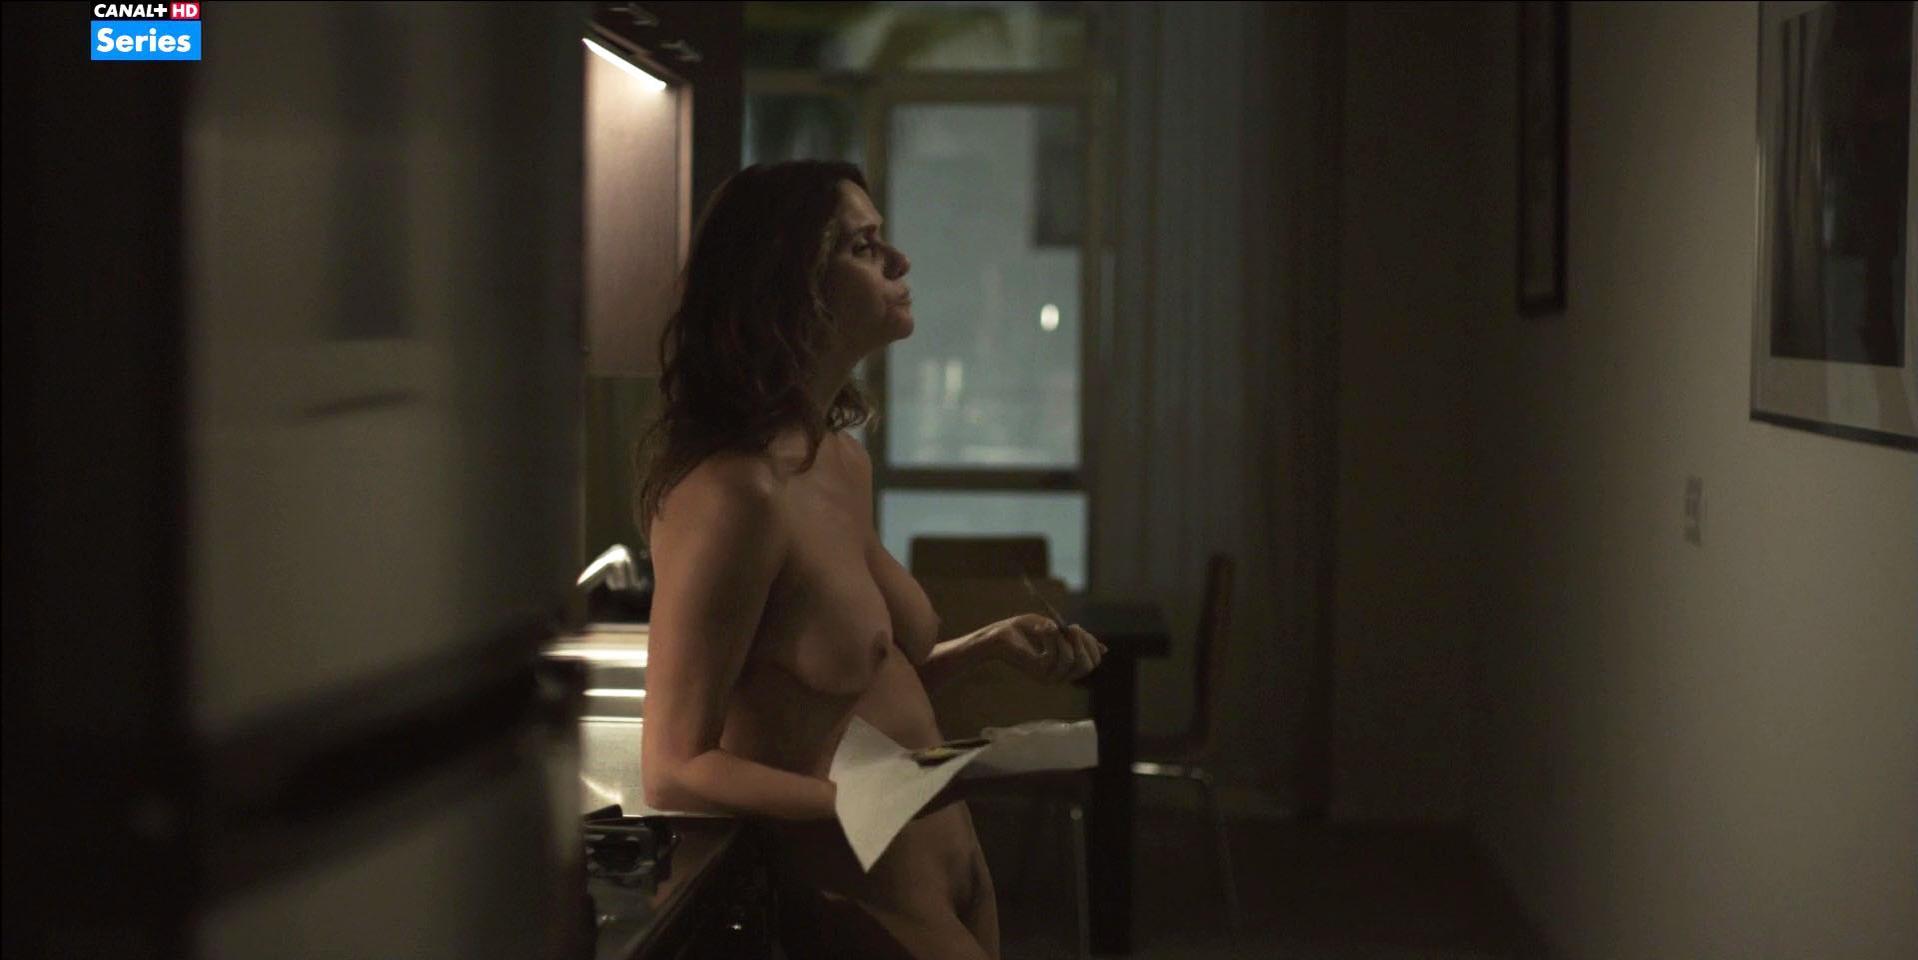 Amy Landecker nude - Transparent s02e04 (2015)